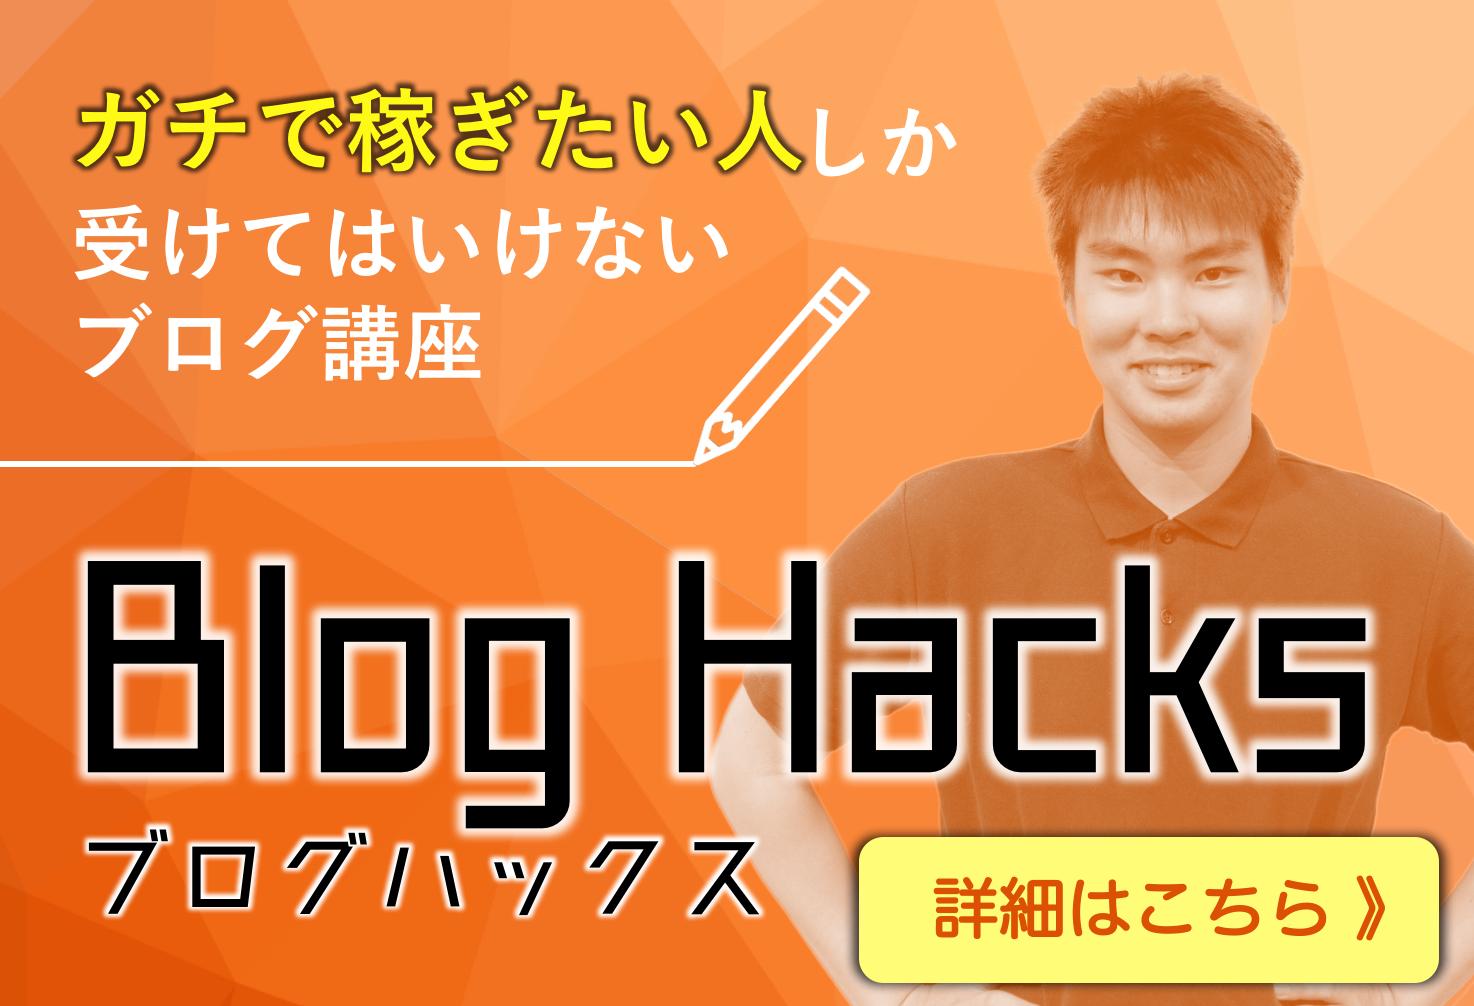 BlogHacks誘導バナー